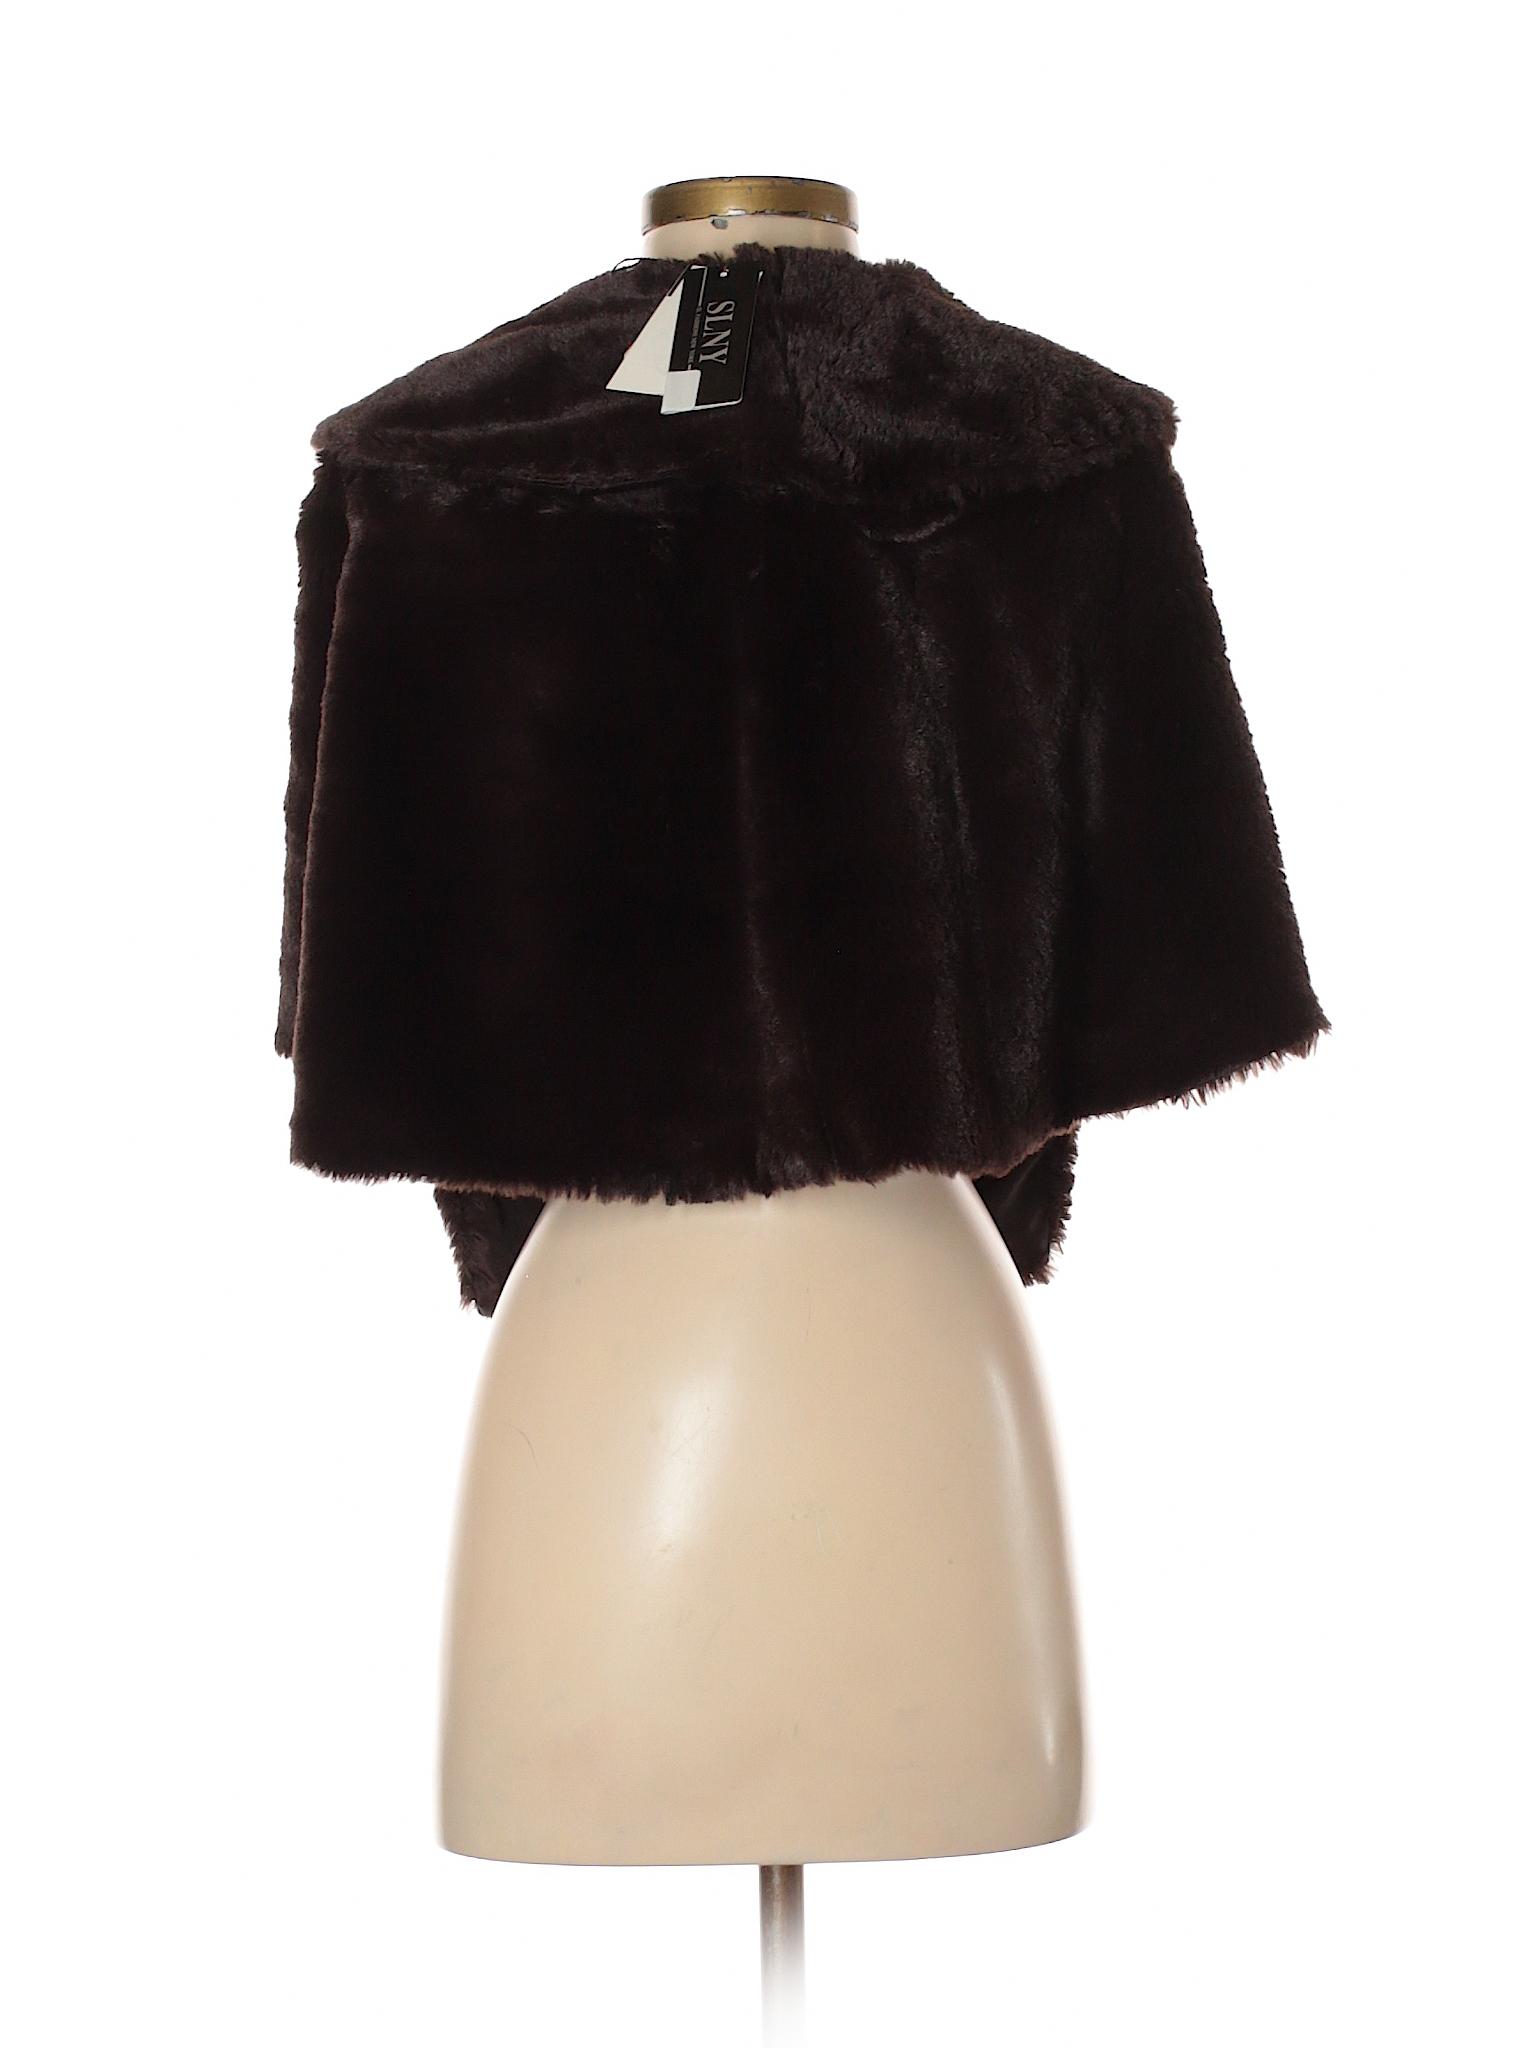 Boutique Poncho L winter S Fashions xrOXFOq